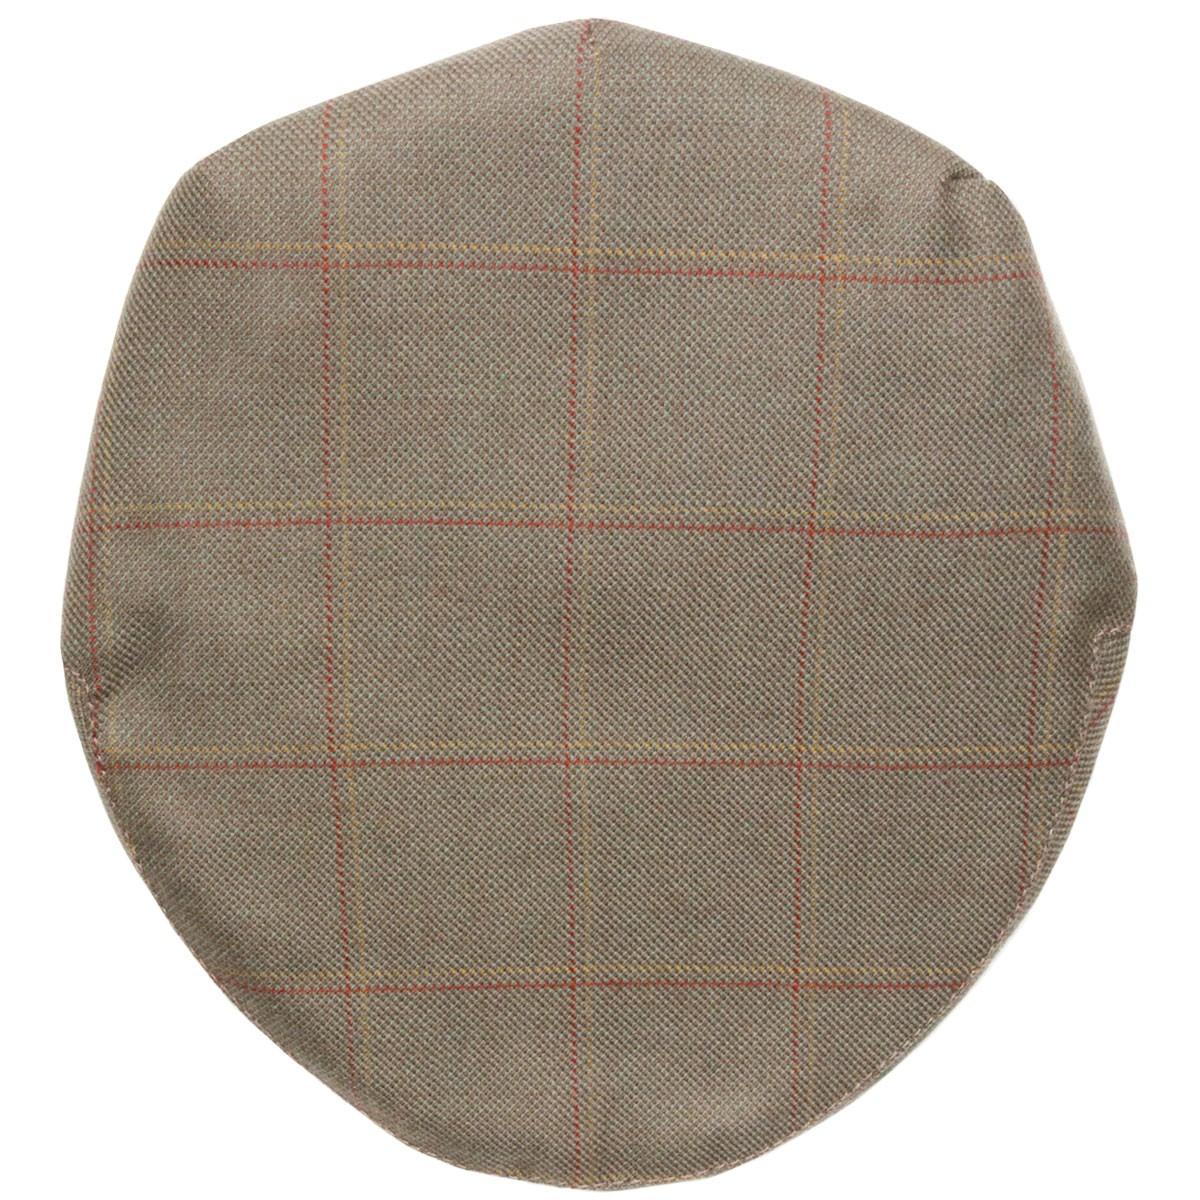 Oban Check Tweed Barnton Flat Cap - Above